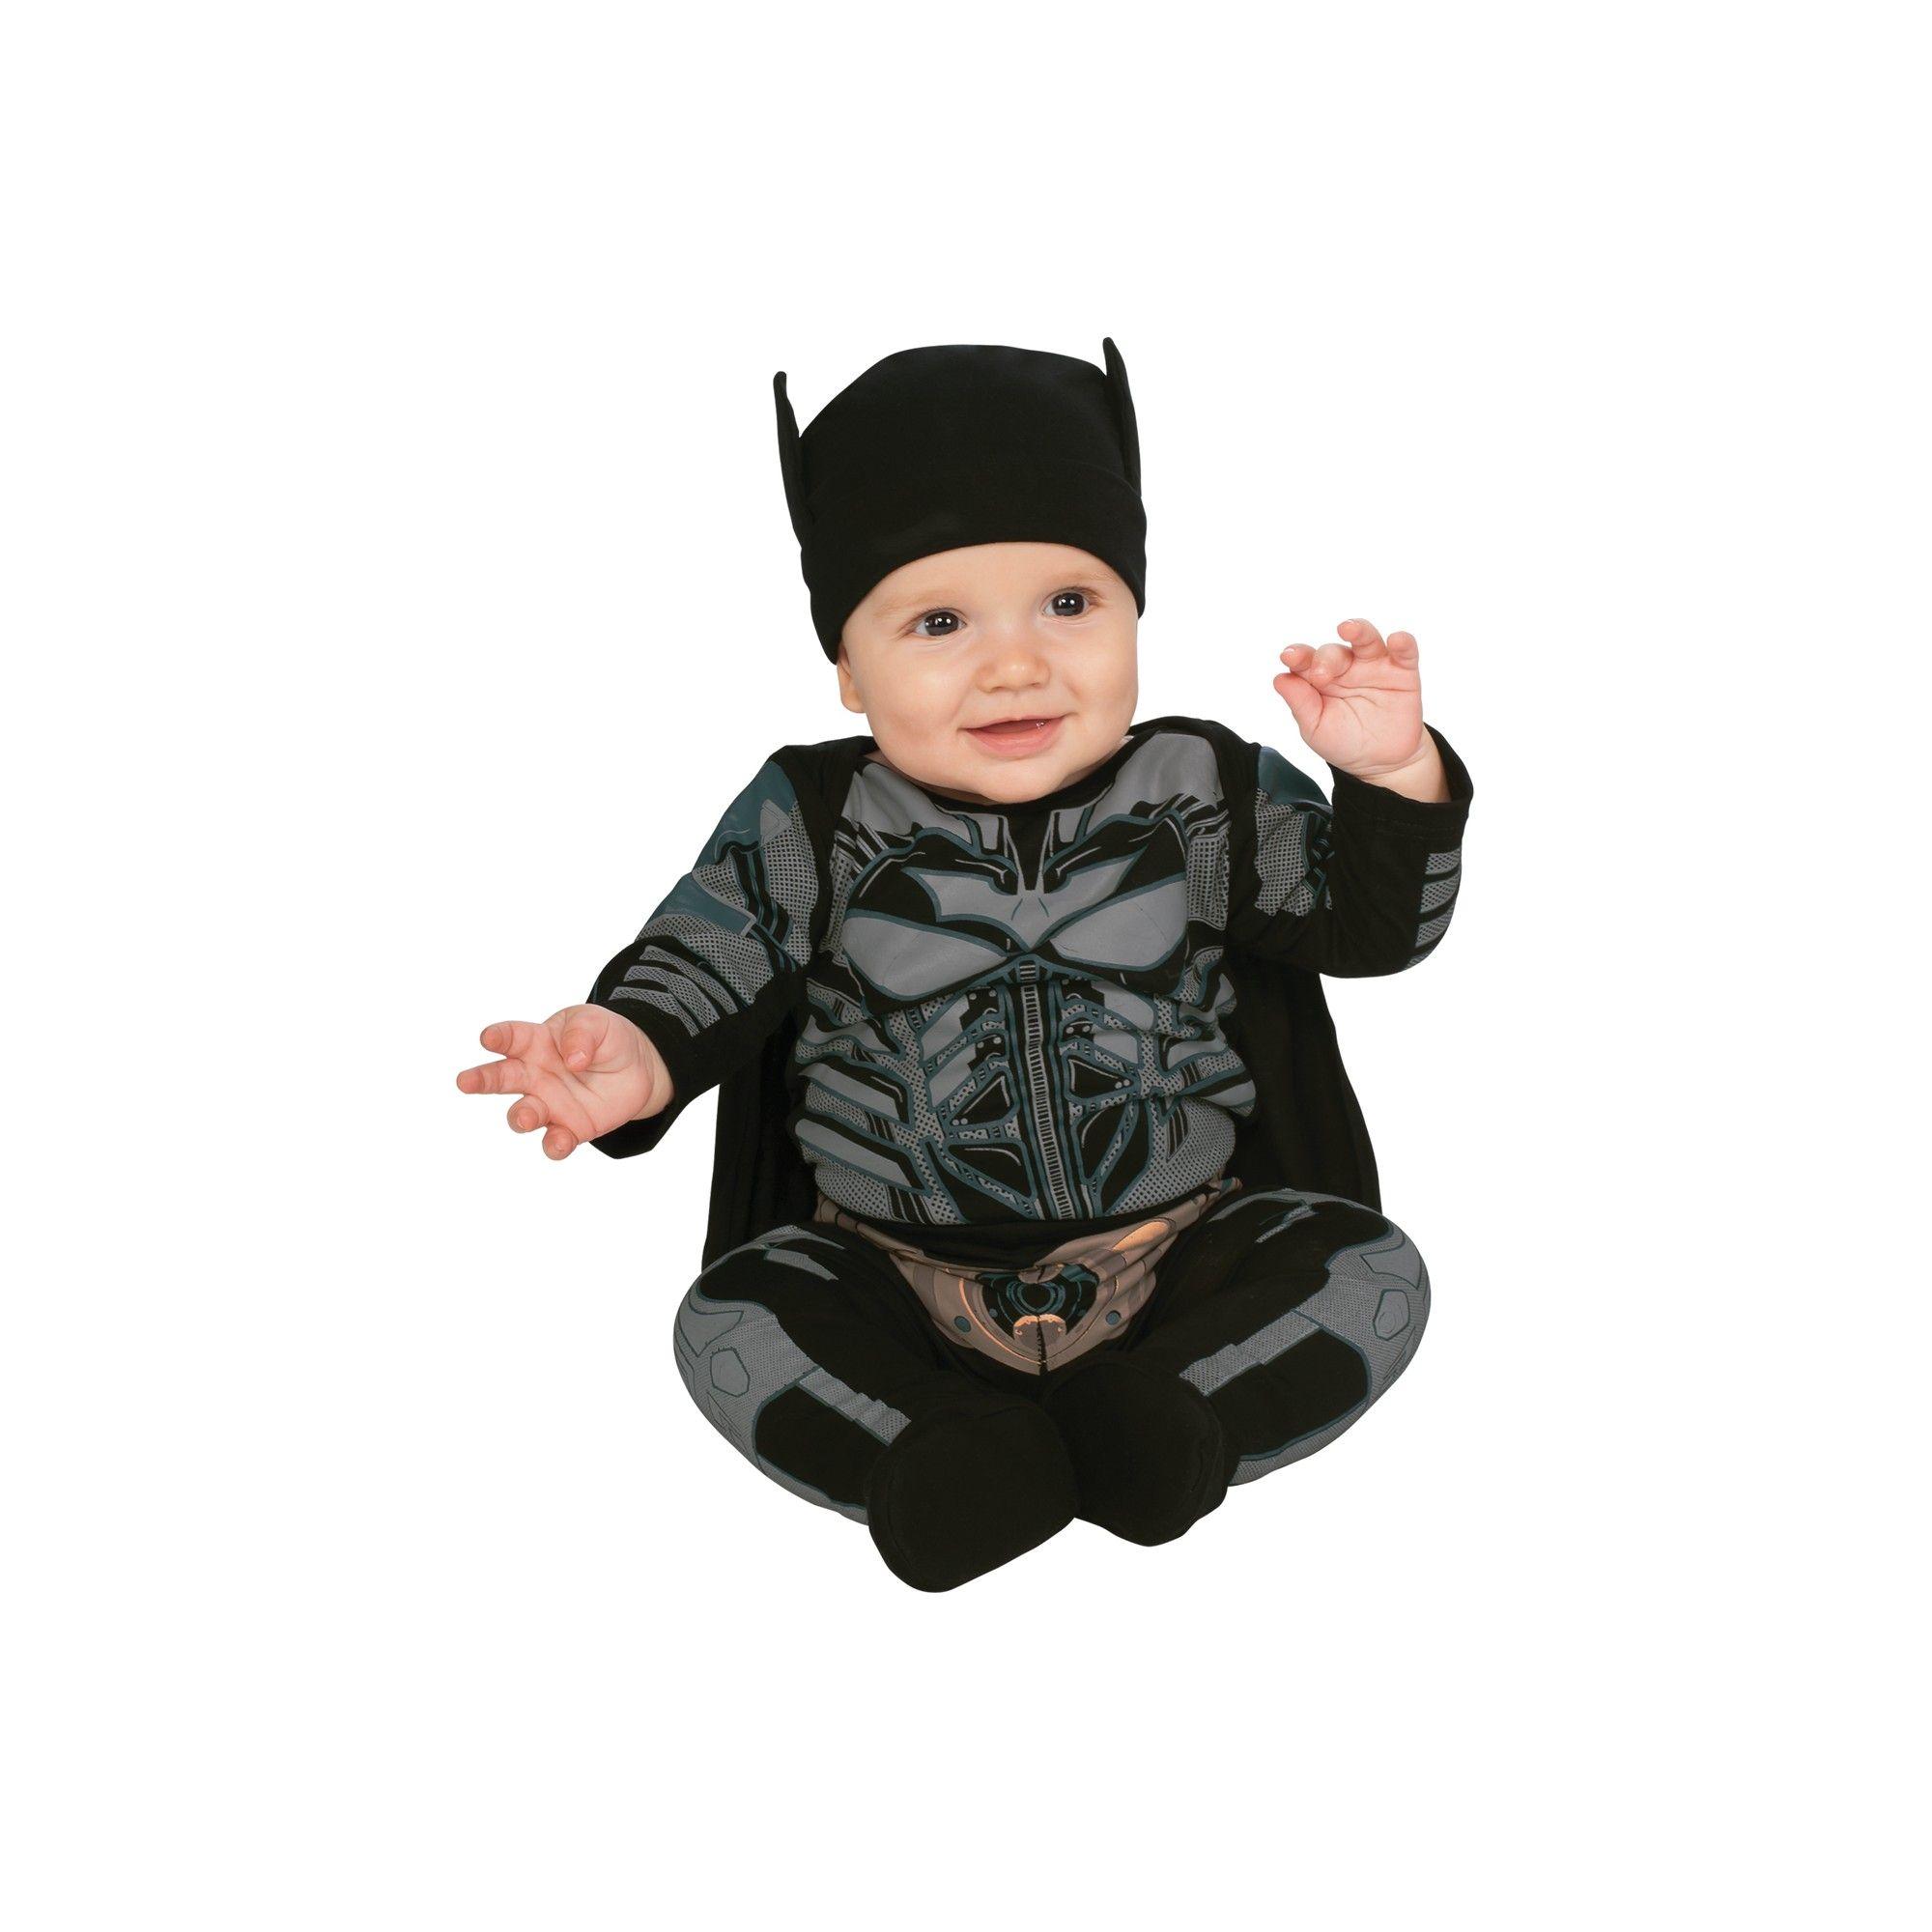 Boysu0027 Batman Toddler Costume 6-12 Months  sc 1 st  Pinterest & Boysu0027 Batman Toddler Costume 6-12 Months Size: 6-12 M Multicolored ...